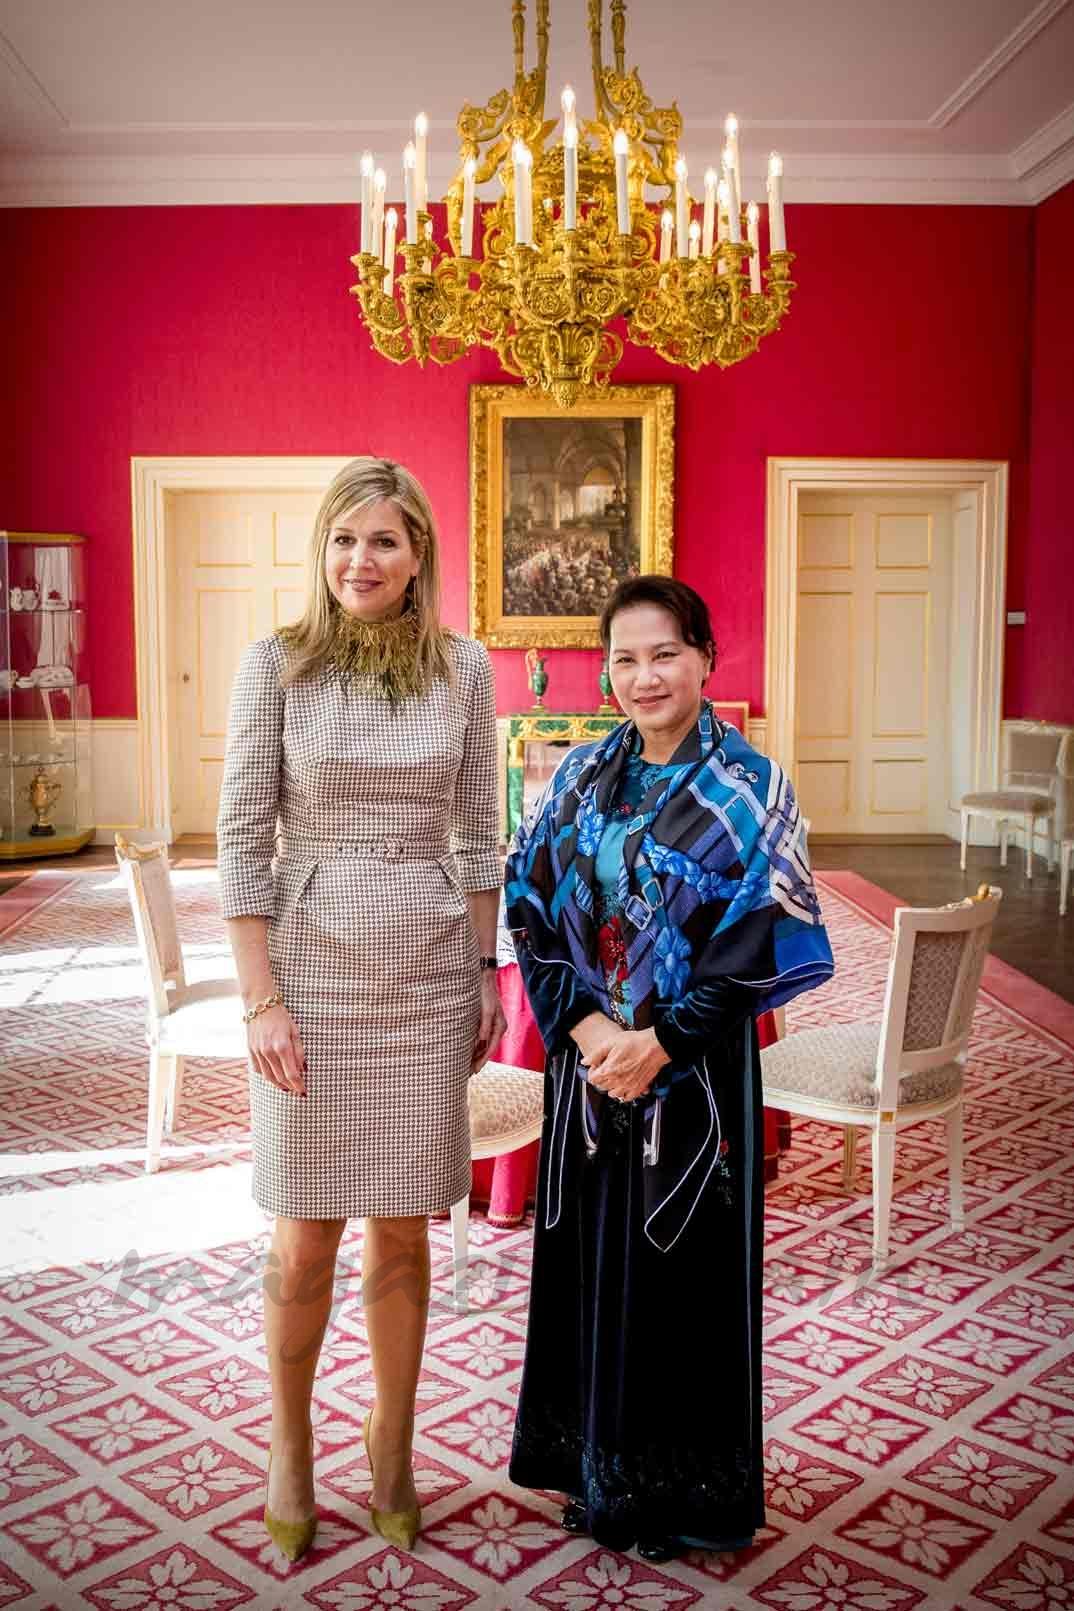 Reina Máxima de Holanda recibe a la mandataria vietnamita Nguyen Thi Kim Ngan